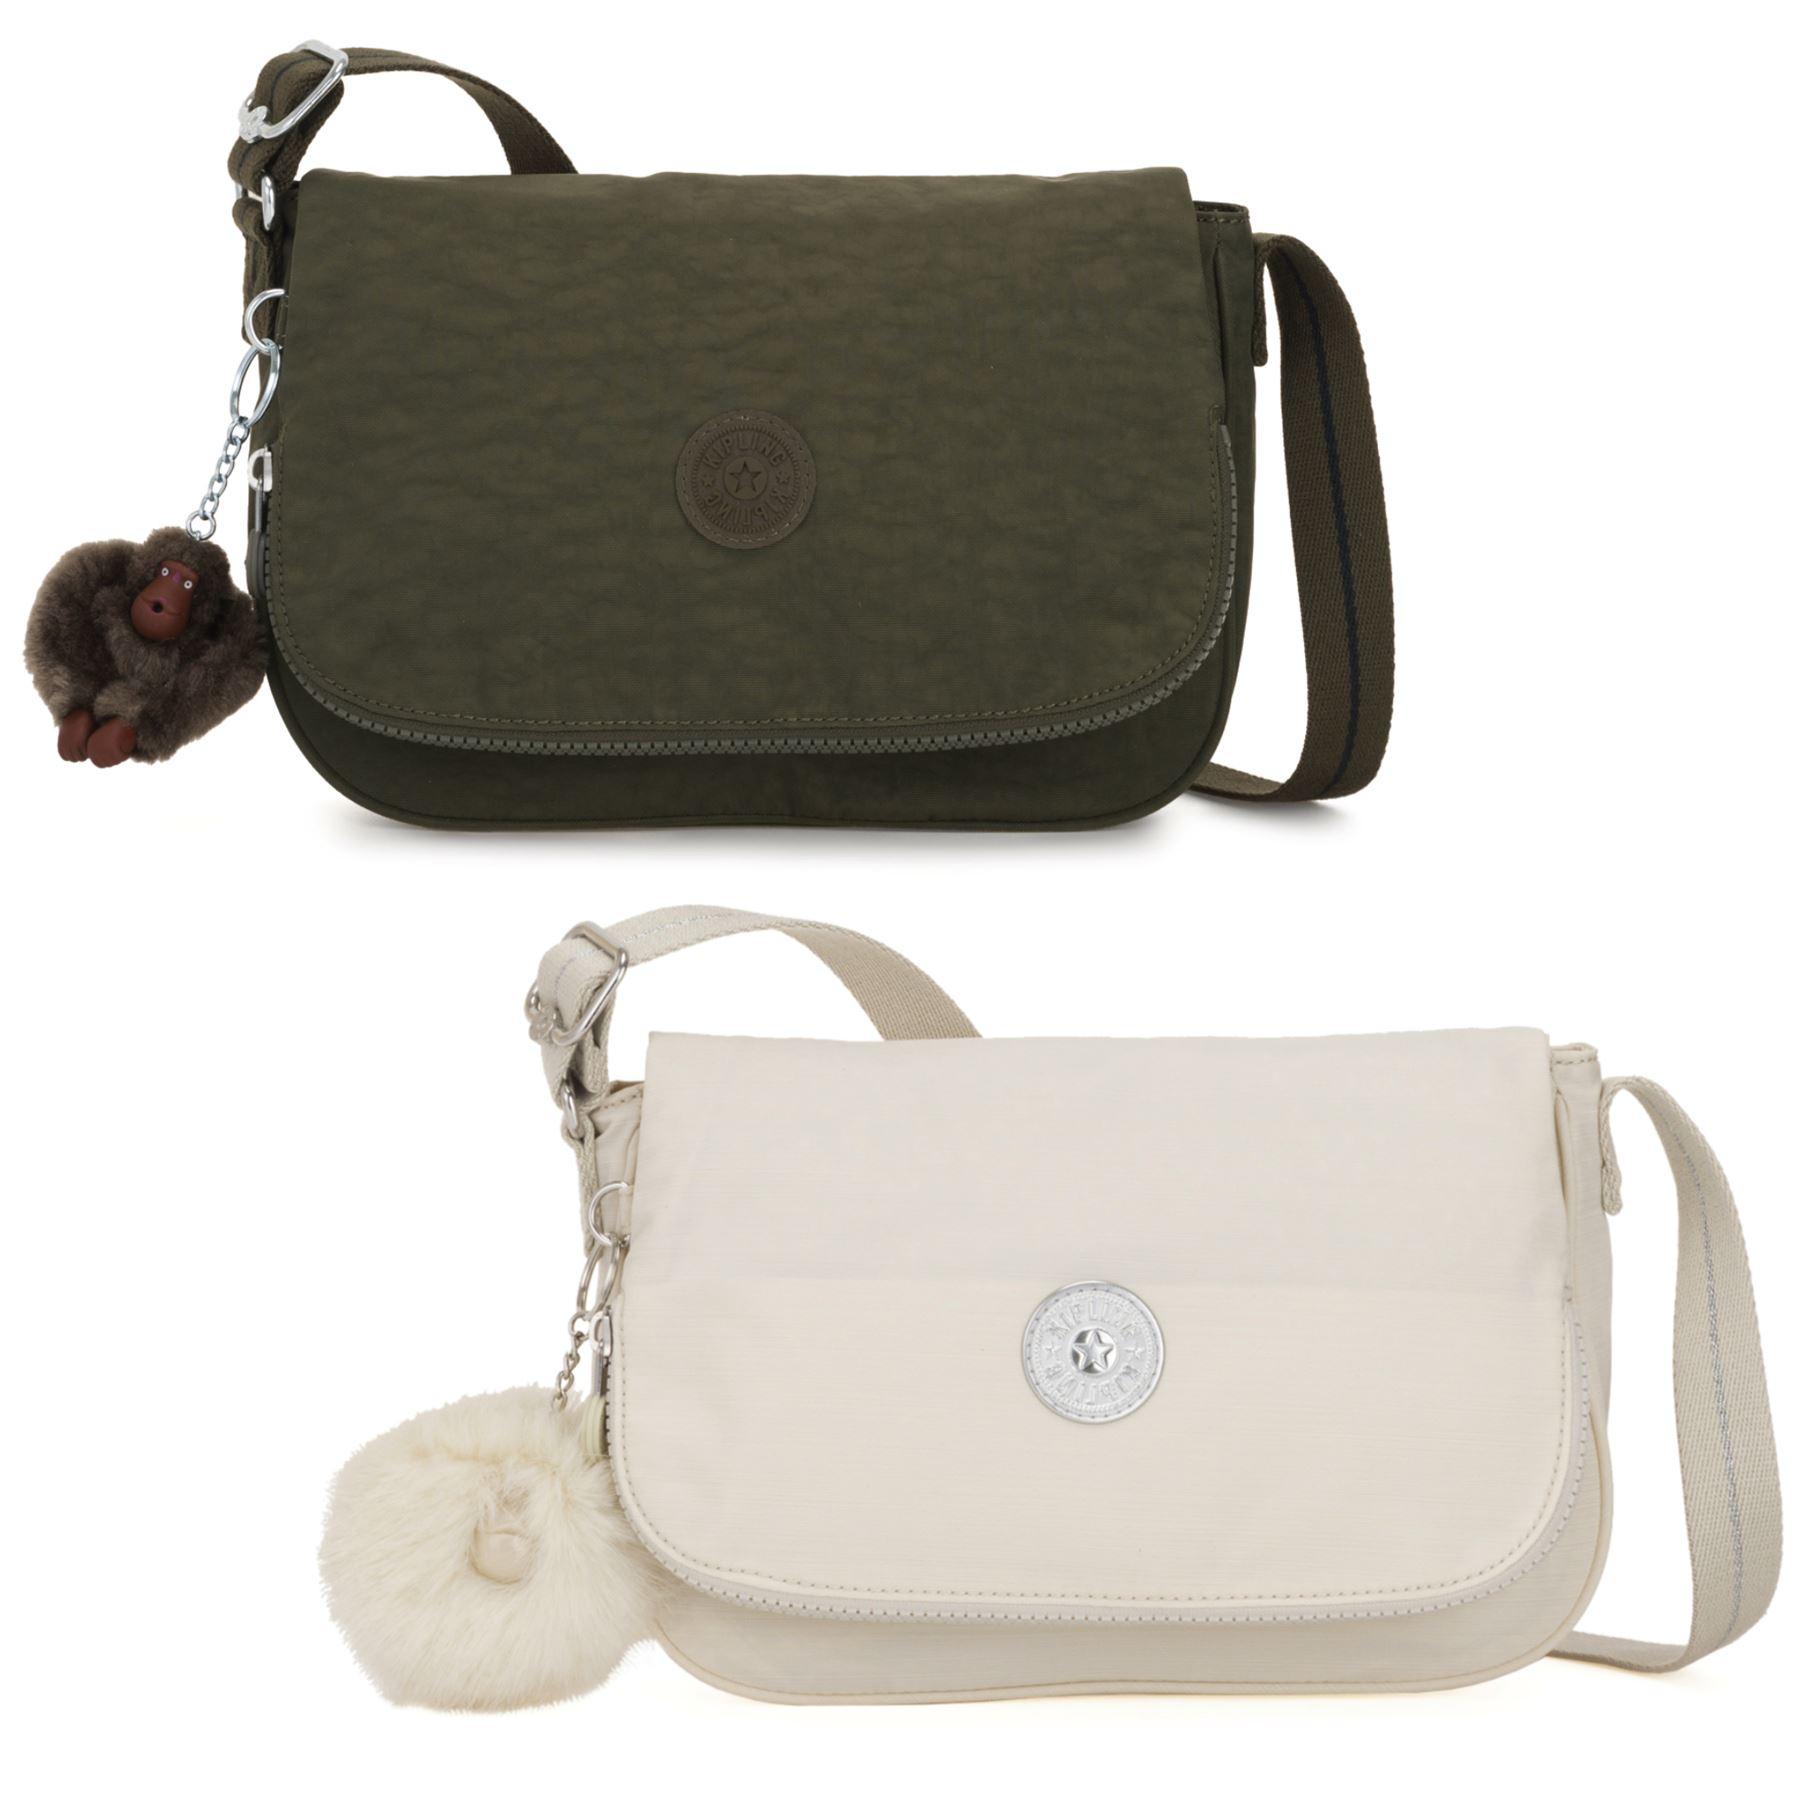 606ef9d47d92 Details about Kipling Earthbeat S Womens   Ladies Fashion Handbag w  Secure  Pocket